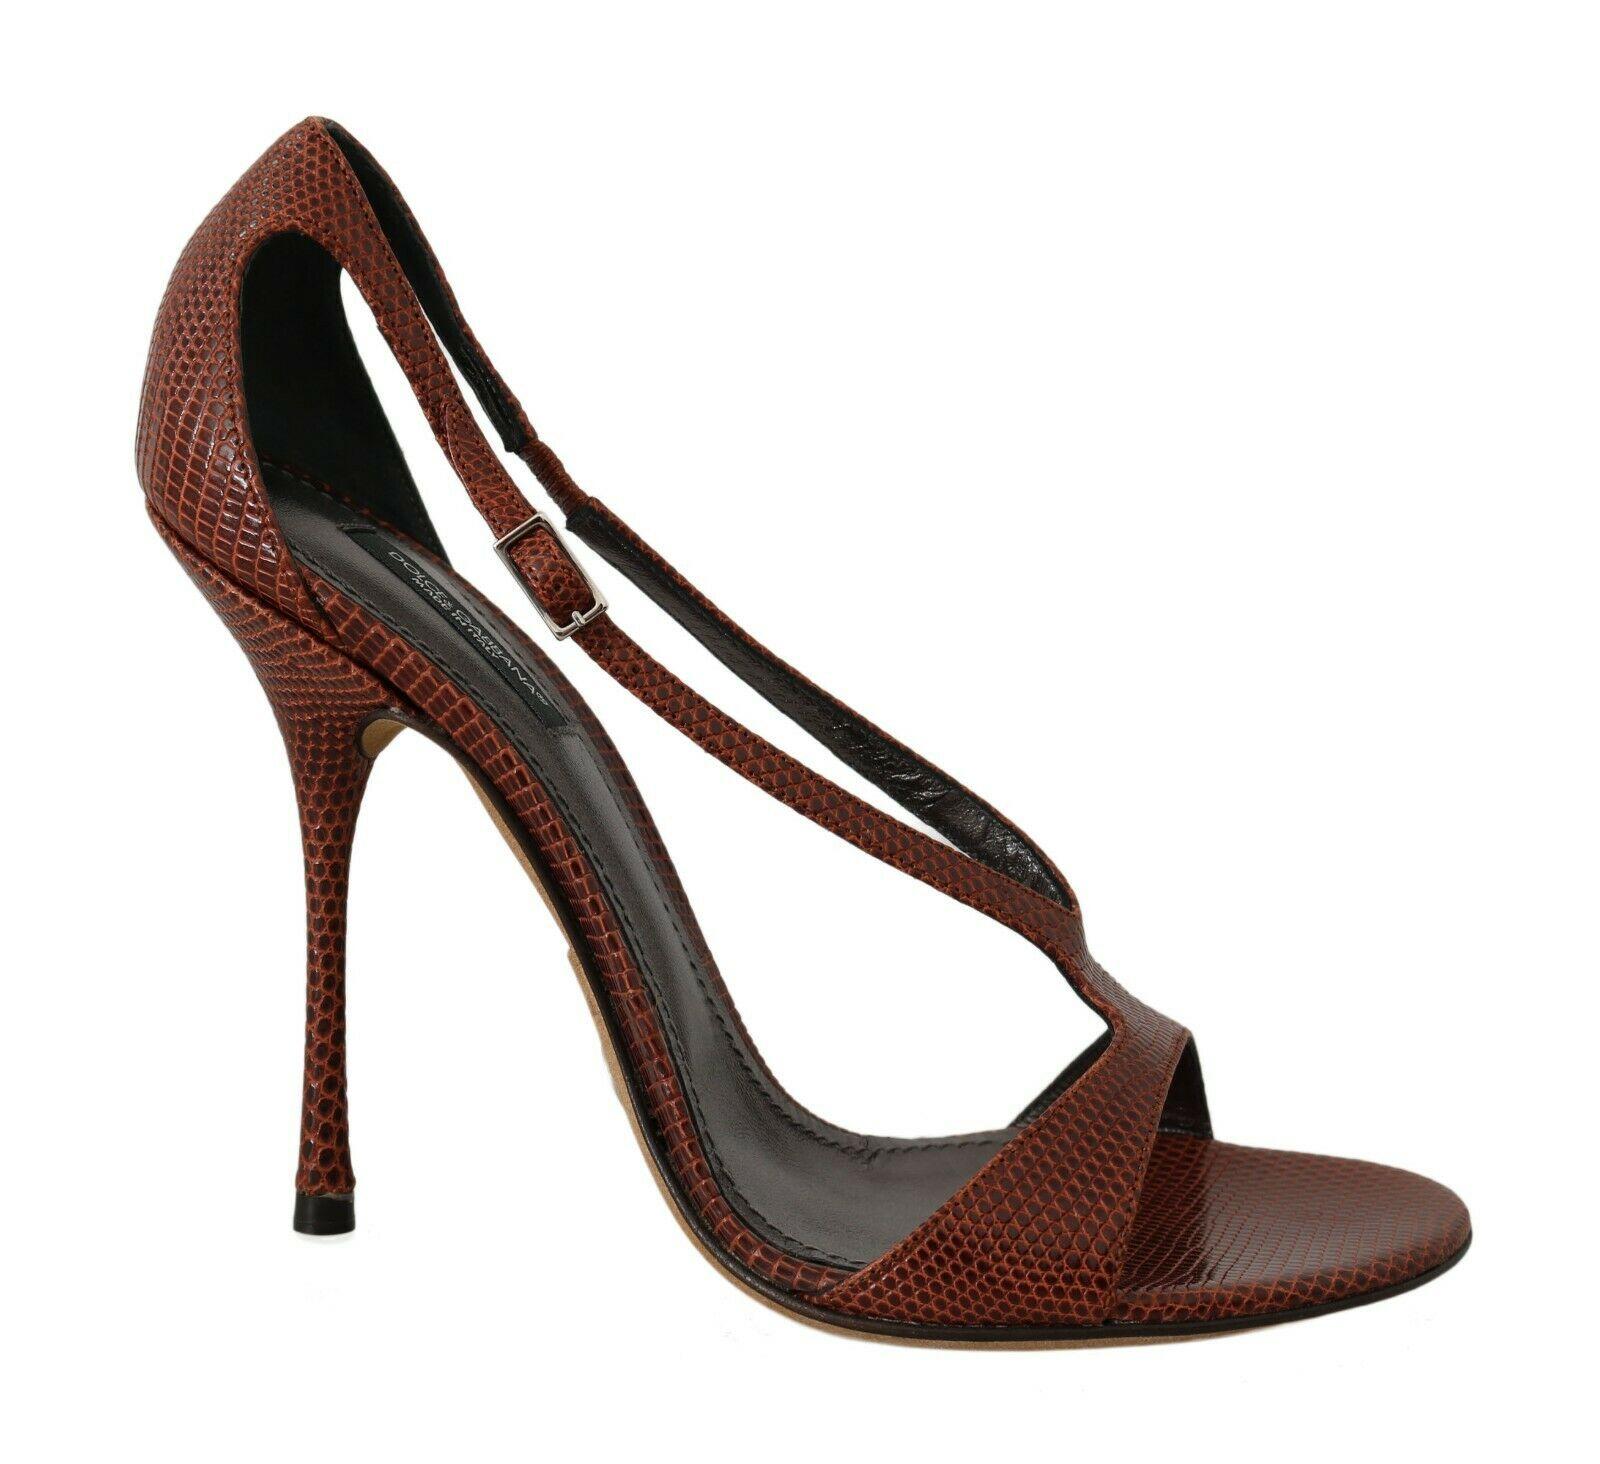 Dolce & Gabbana Women's Leather Lizard Iguana Pumps Brown LA5741 - EU39/US8.5